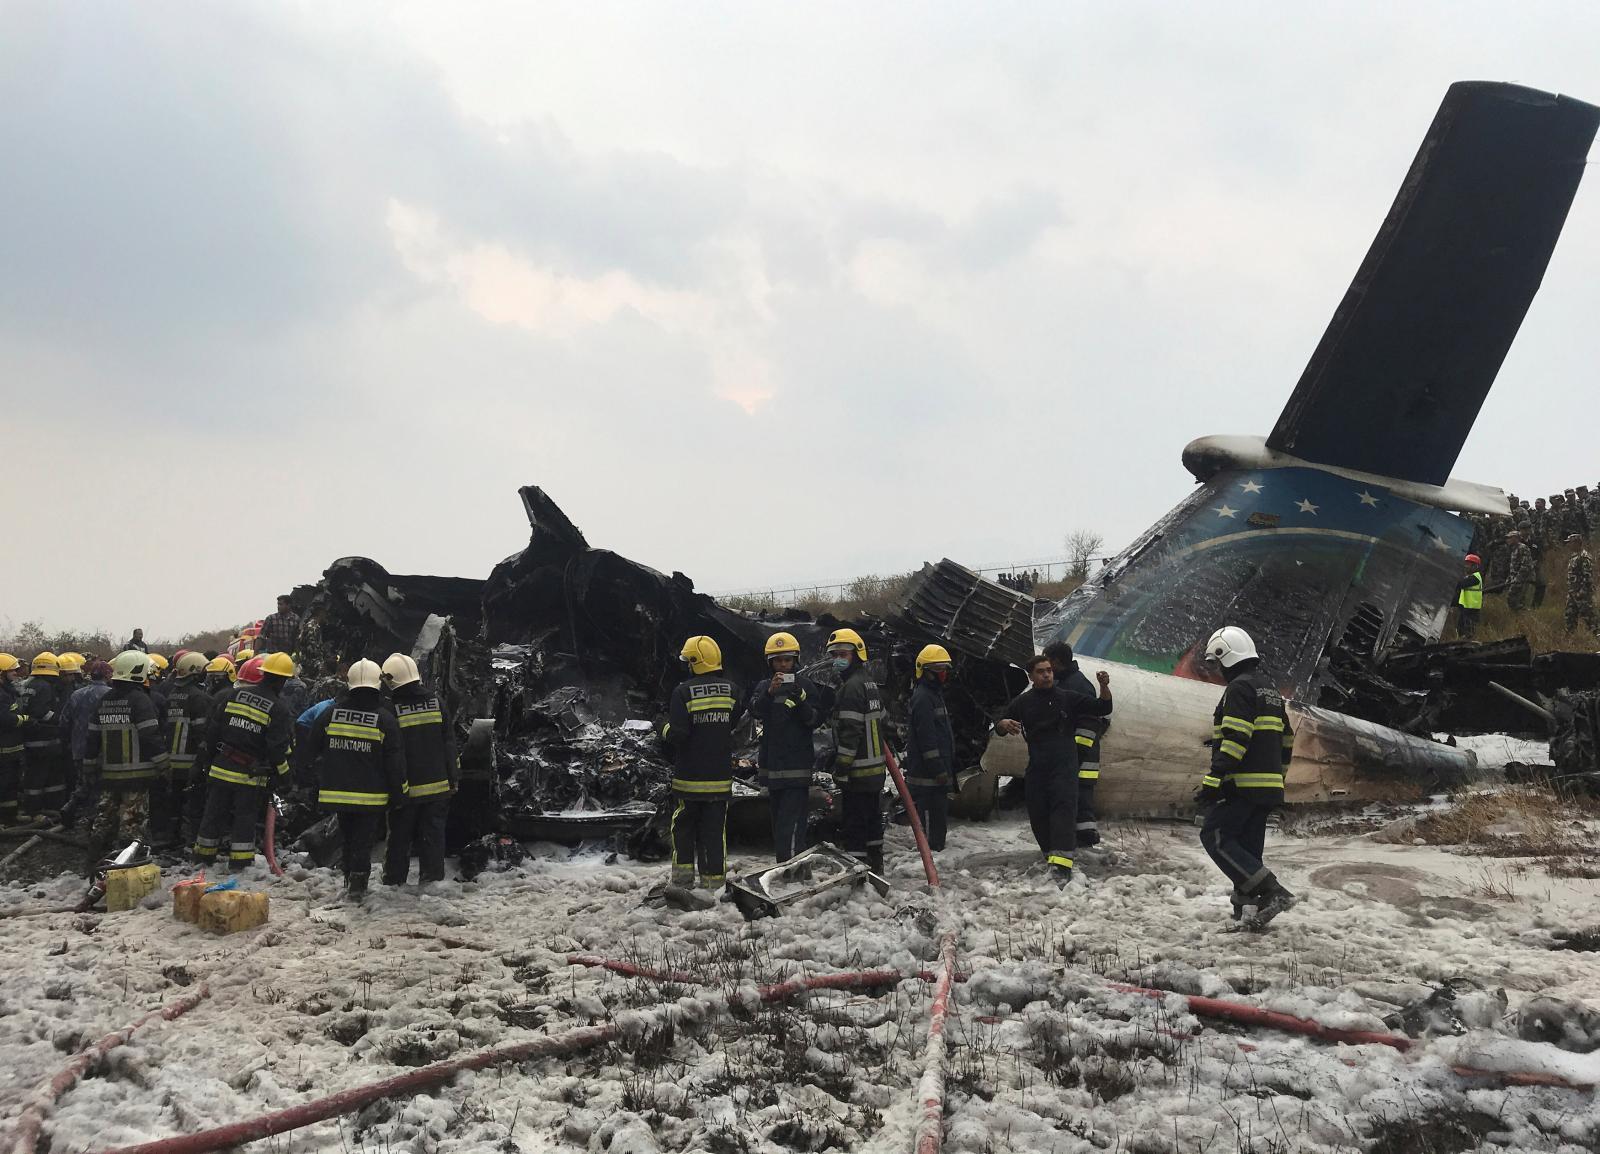 Bangladesh plane carrying 71 people crashes in Nepal